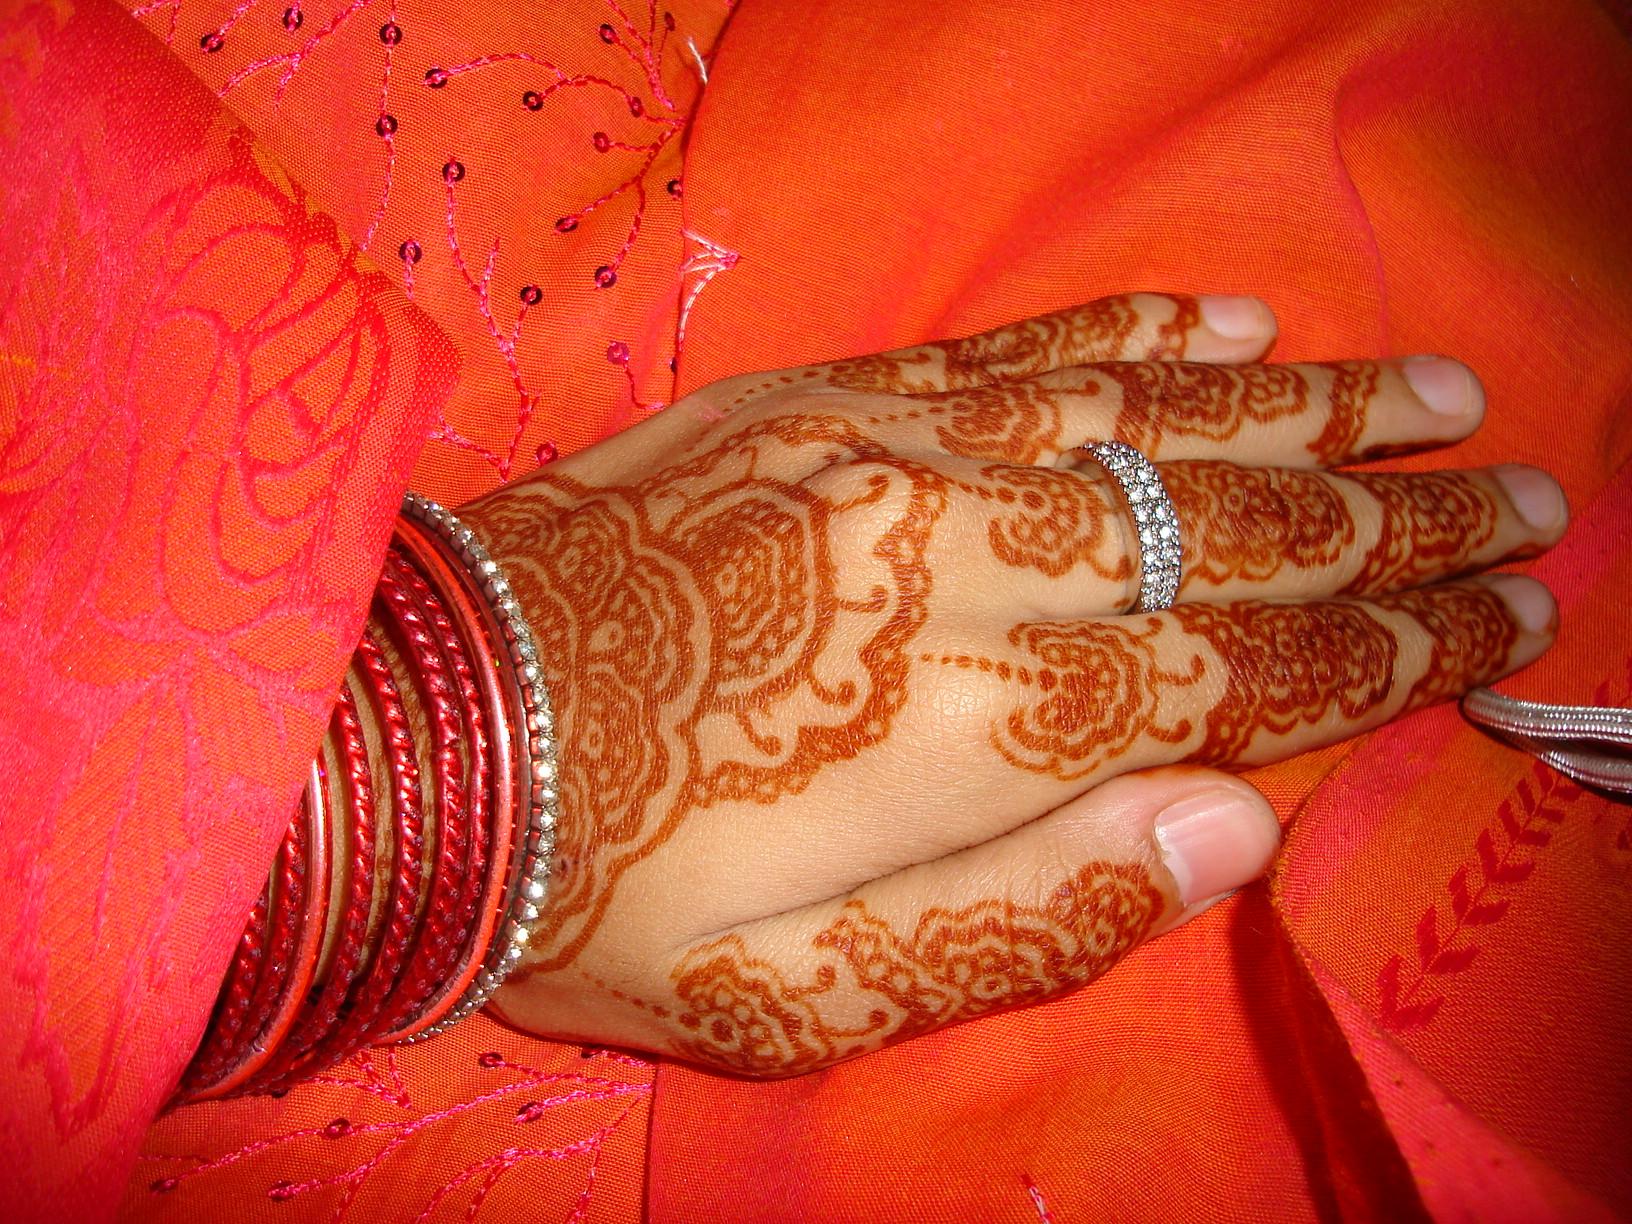 File:Henna decoration on palm prior to Islamic wedding.jpg ...